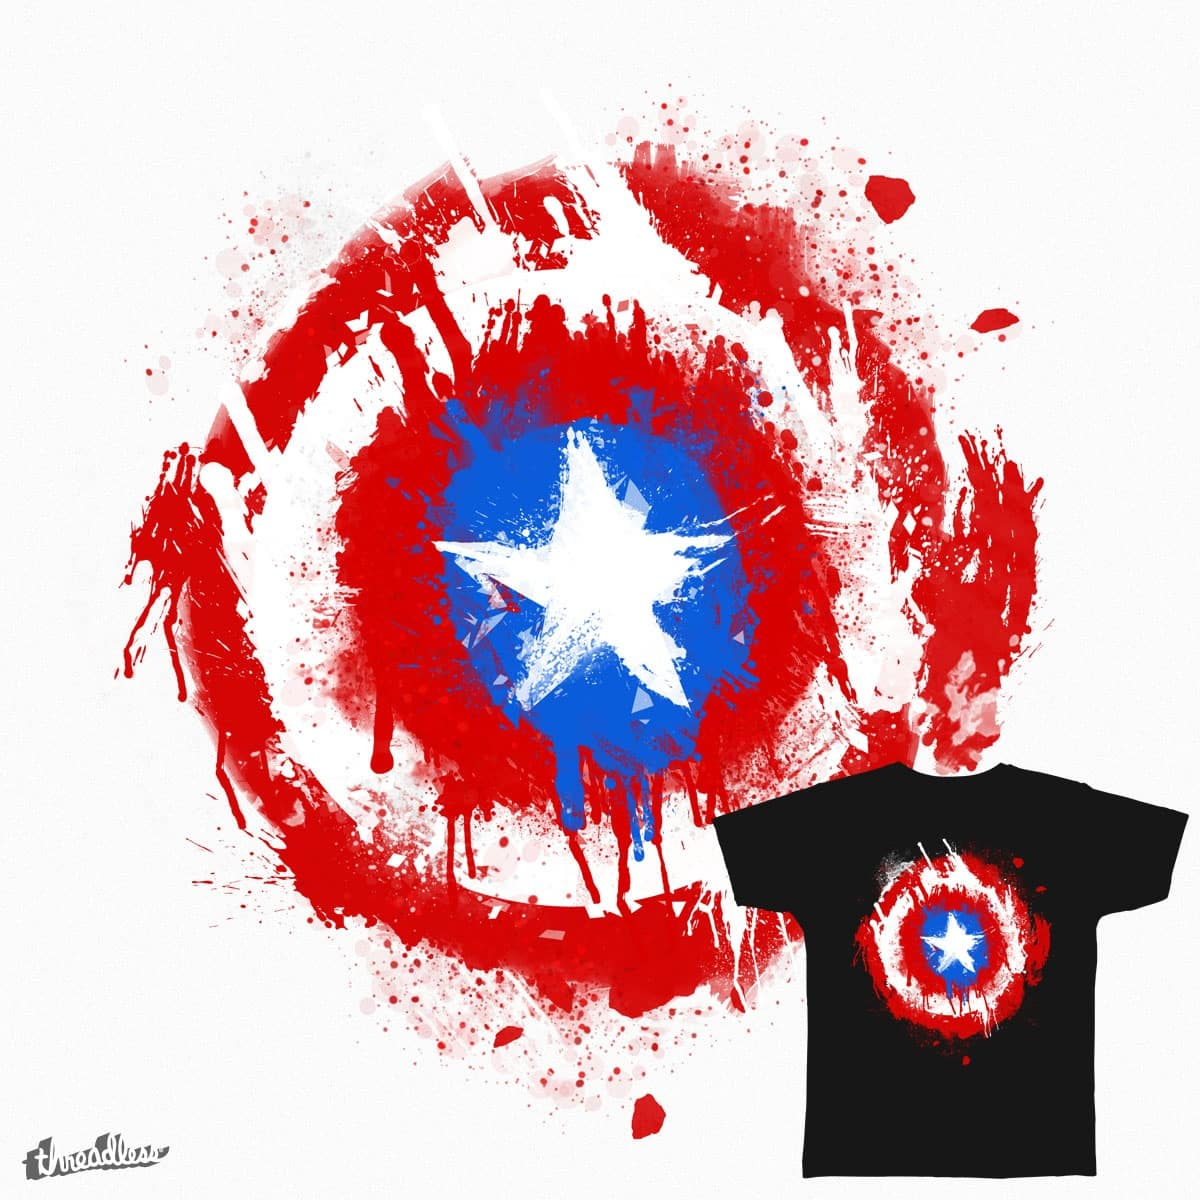 star shield by ben35dan on Threadless